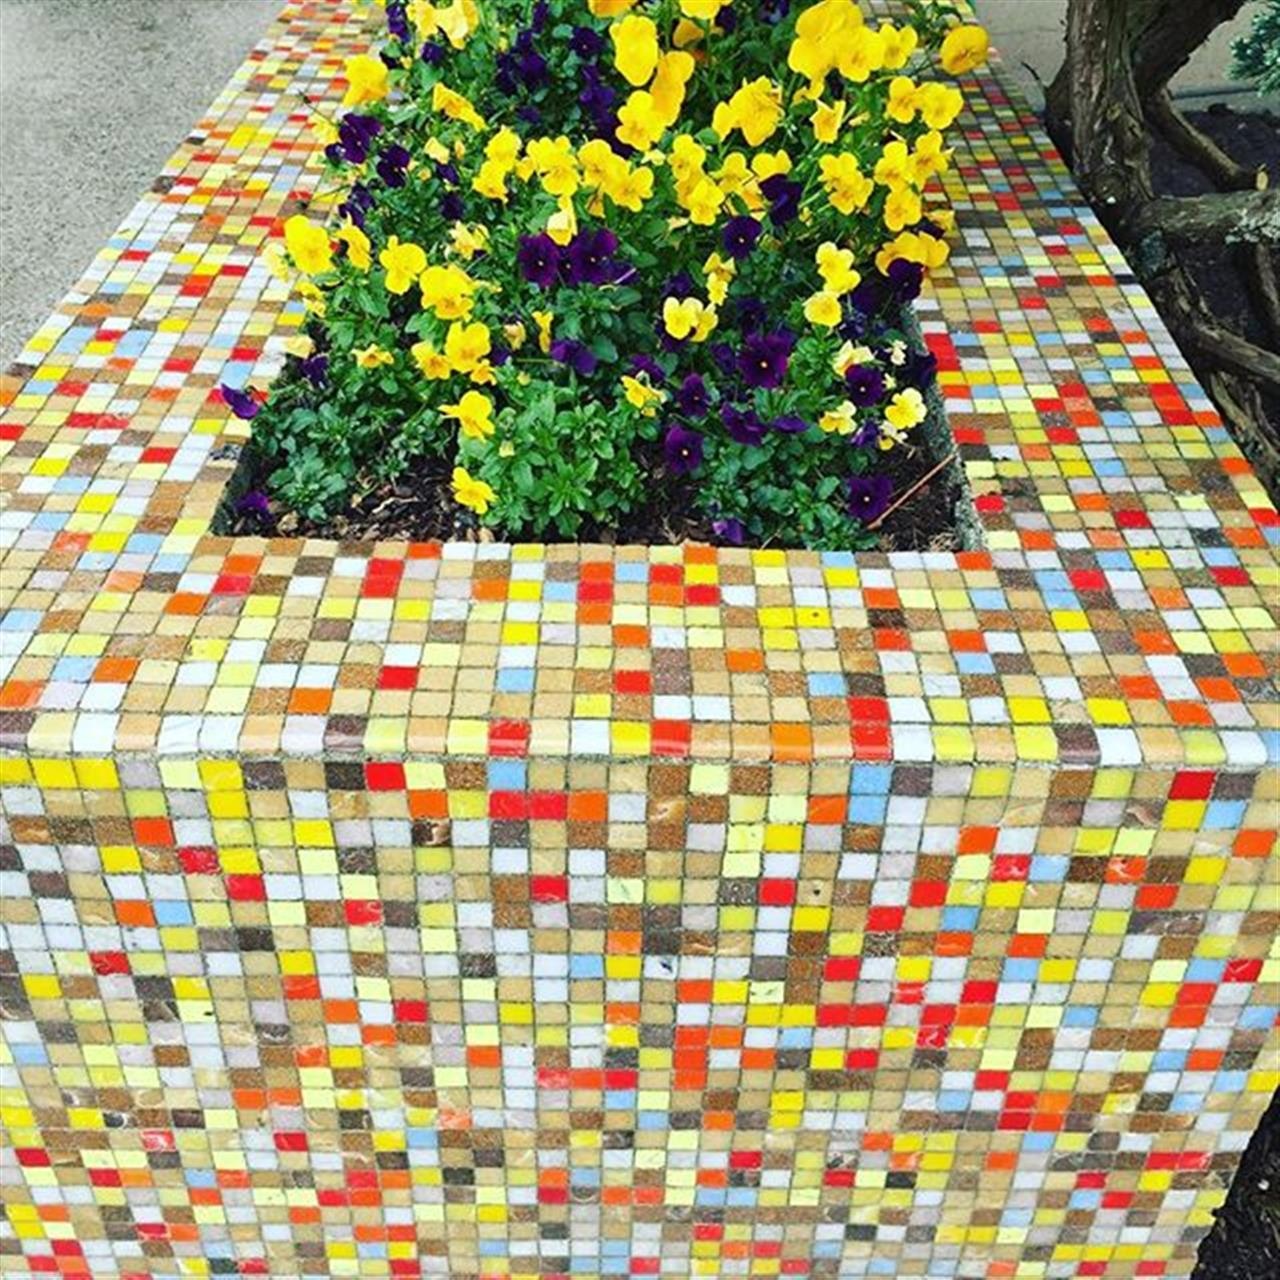 #oakbay #spring #leadingrelocal #realtor #tiles #posies